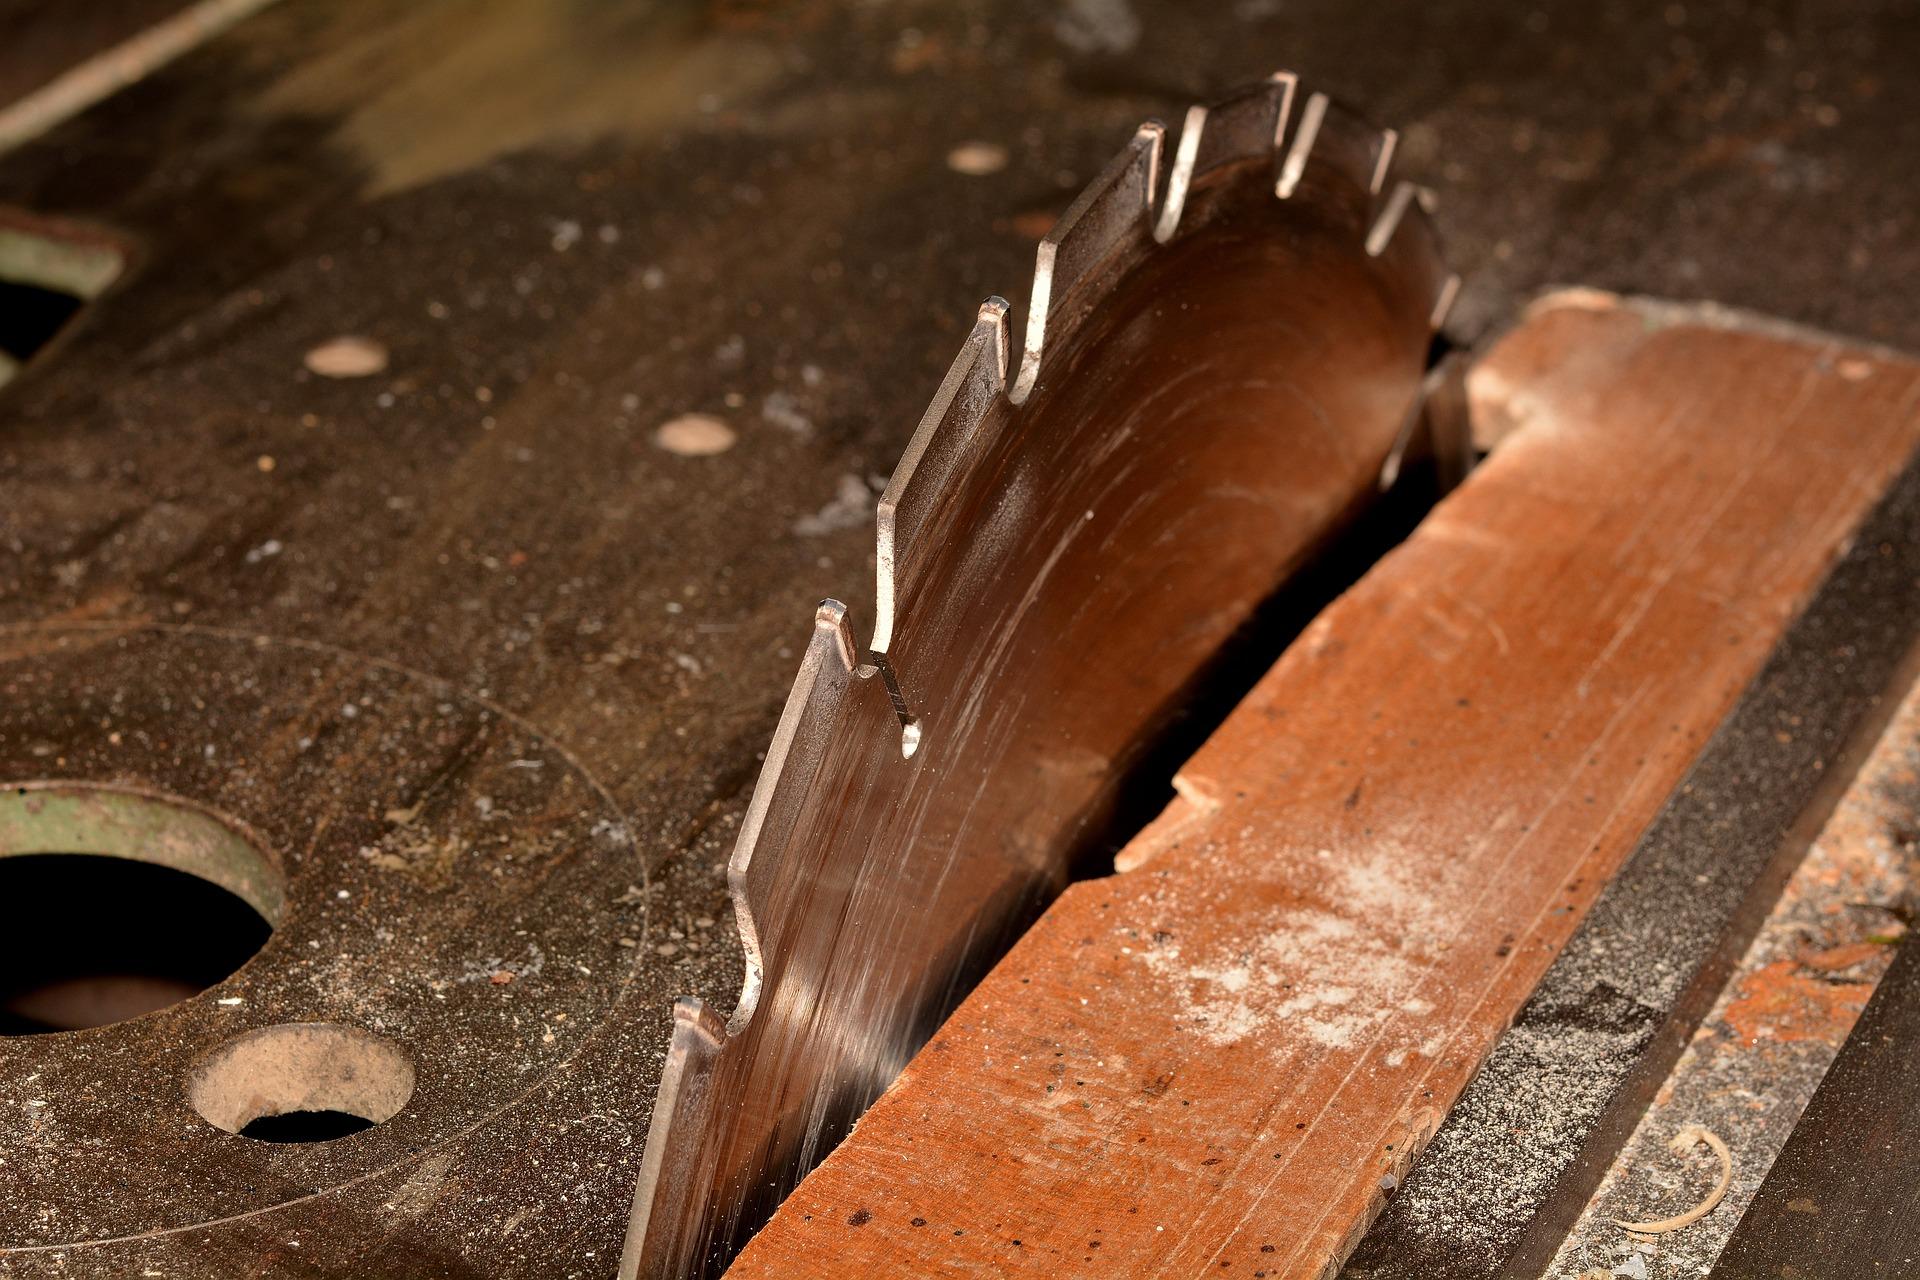 Sharpened Saw Blade